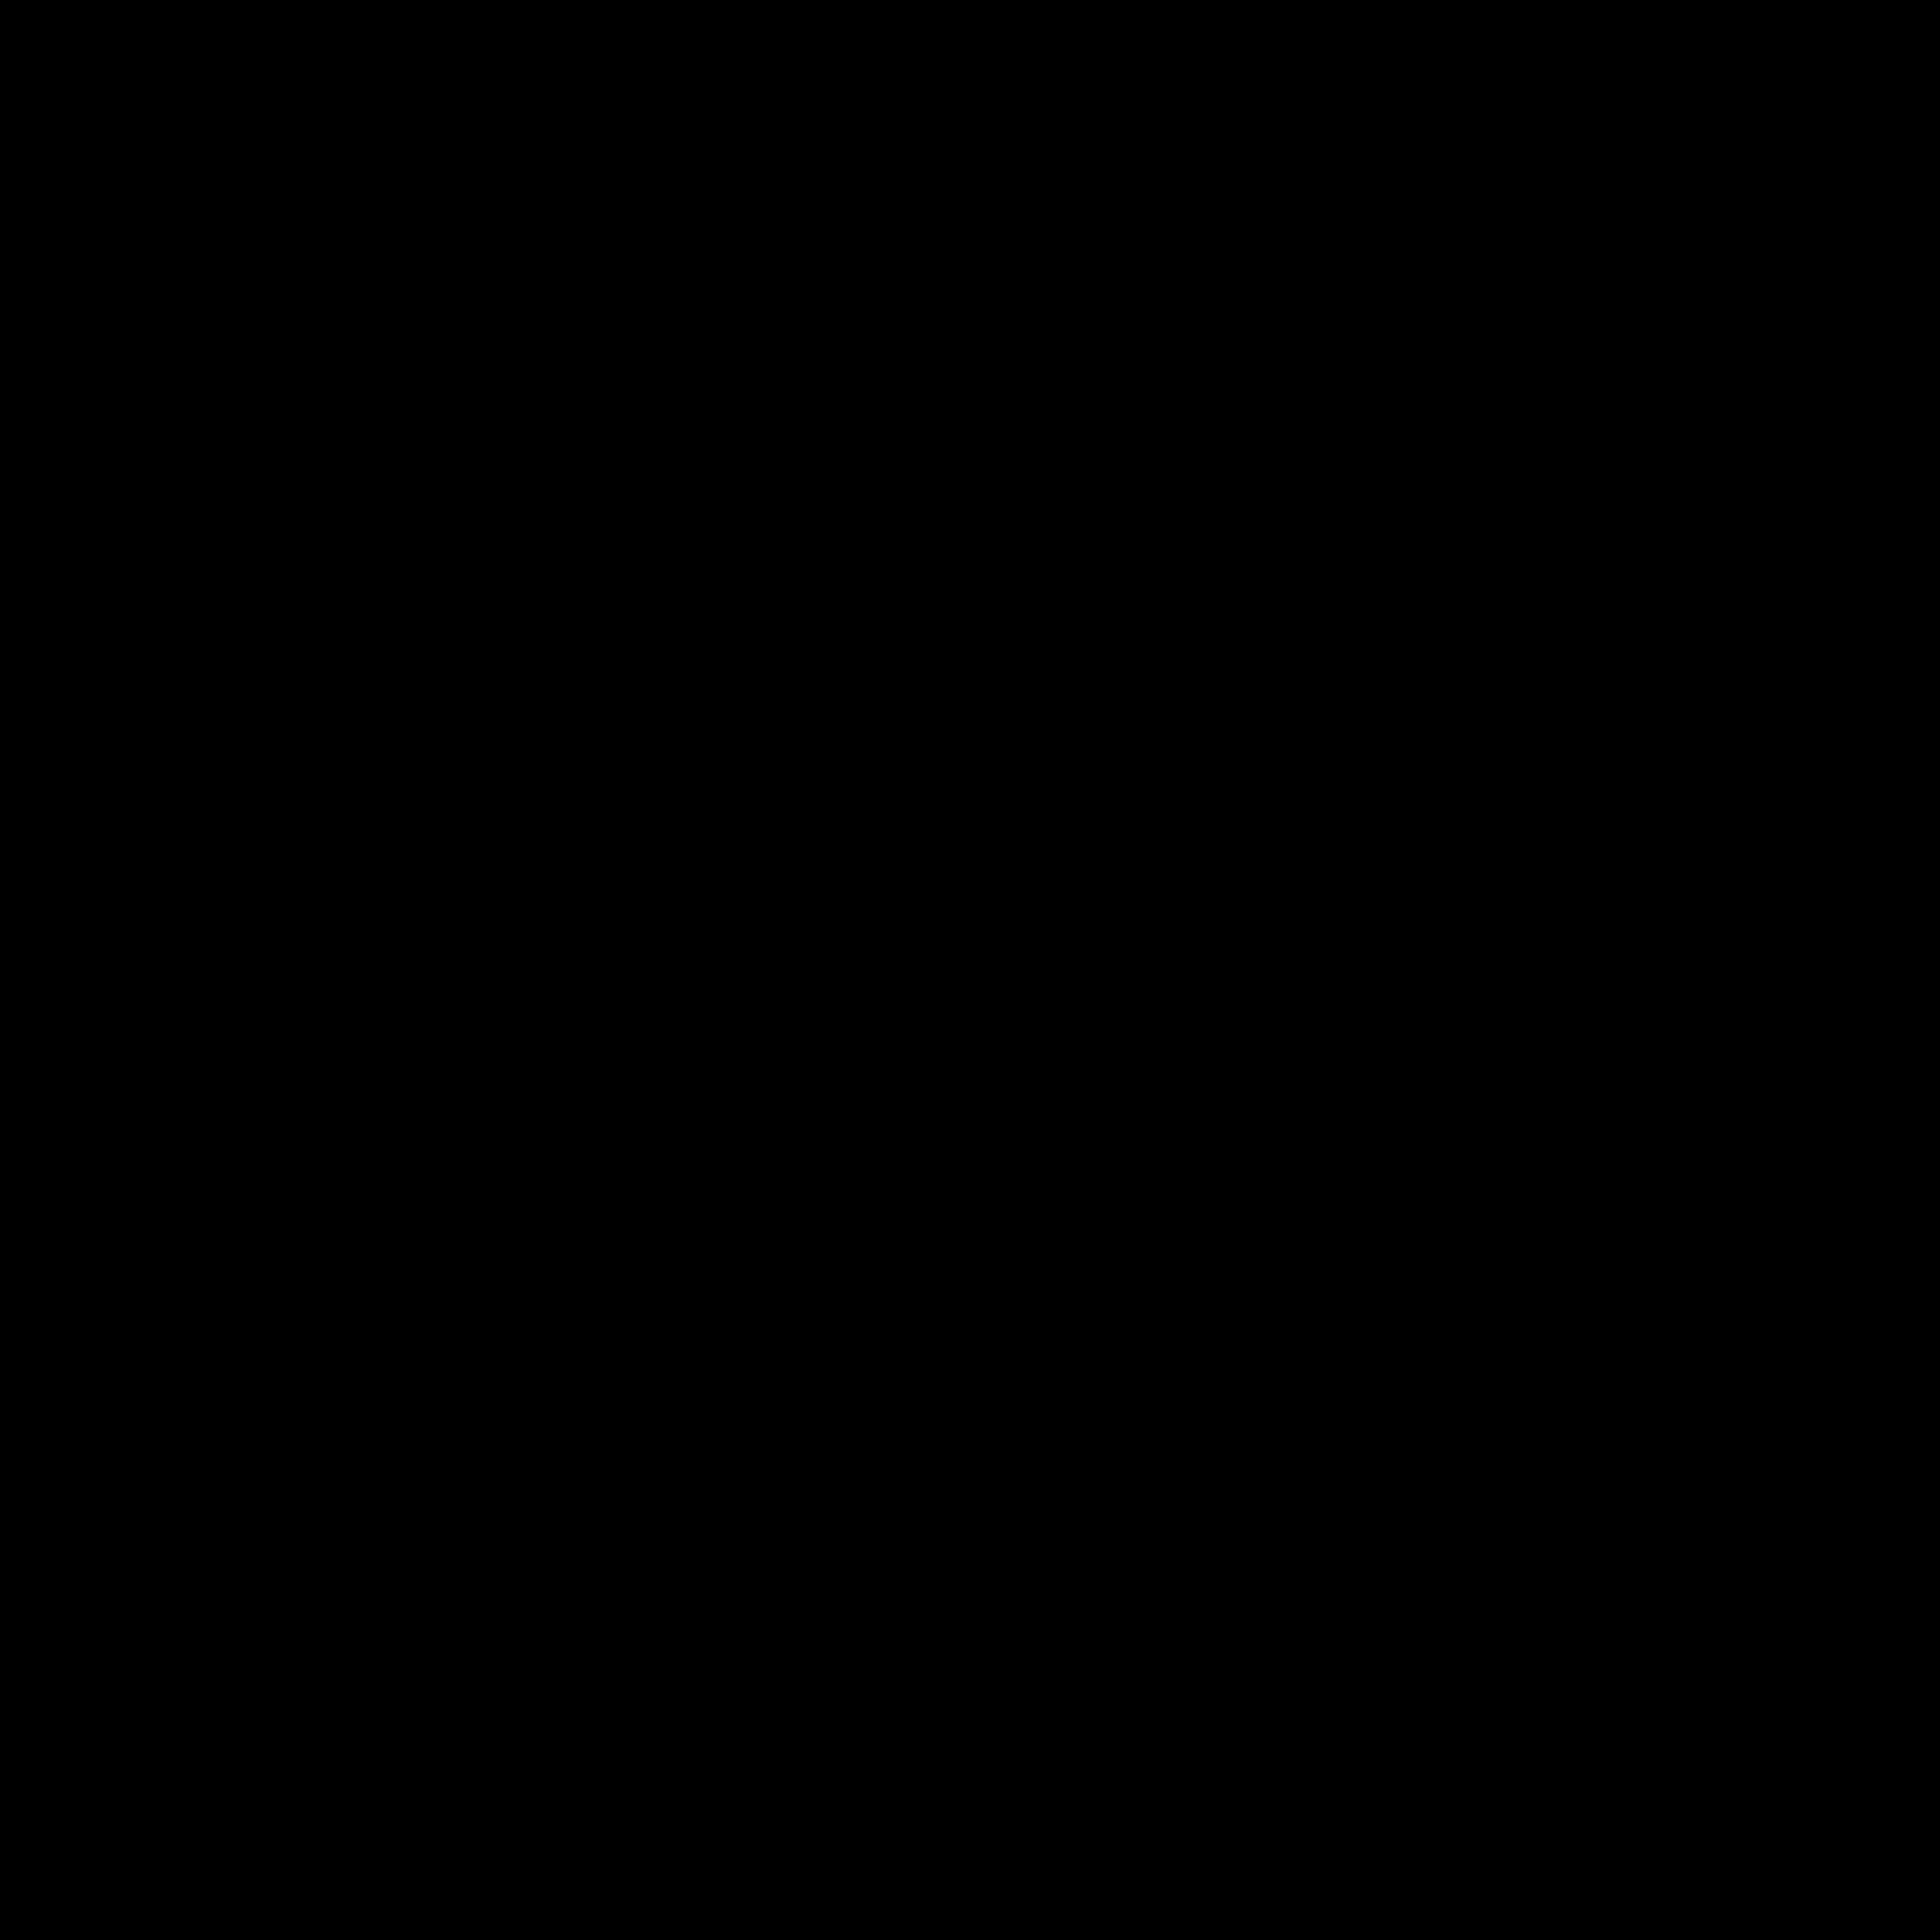 Dot three